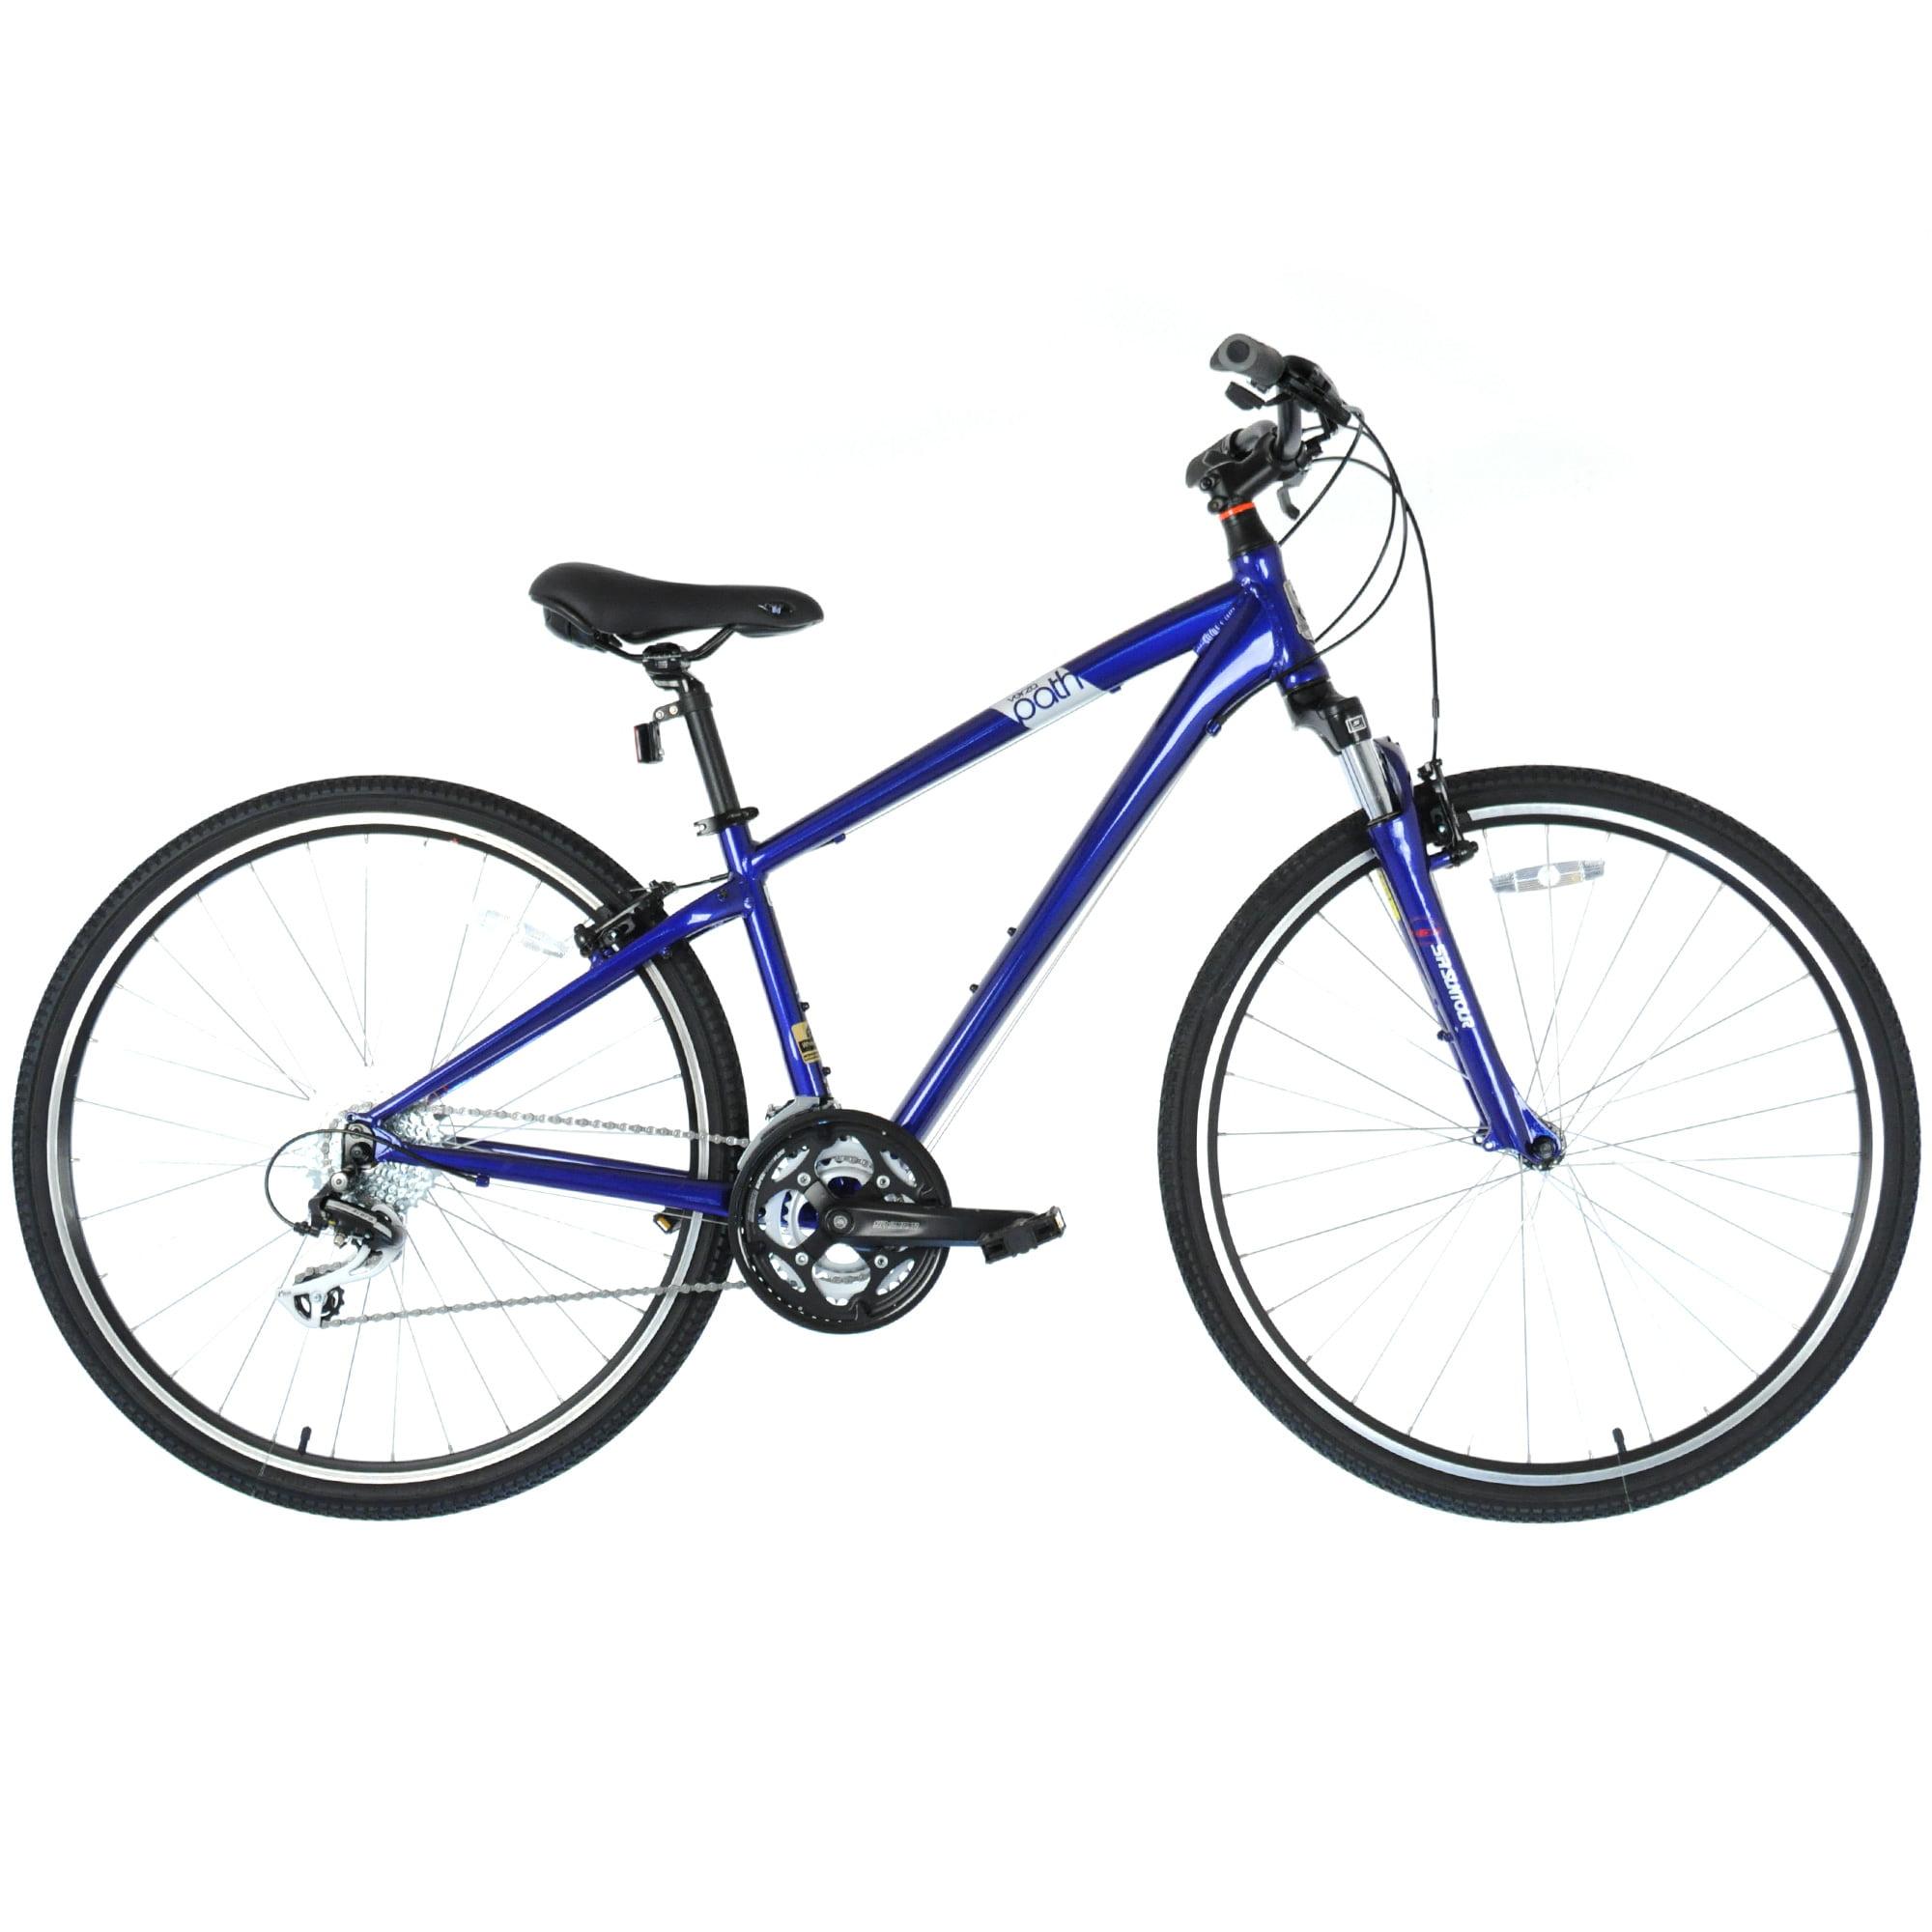 "2016 FELT Verza Path 20 Upright Hybrid Fitness Bike 3x8-Speed // Blue // 16"""